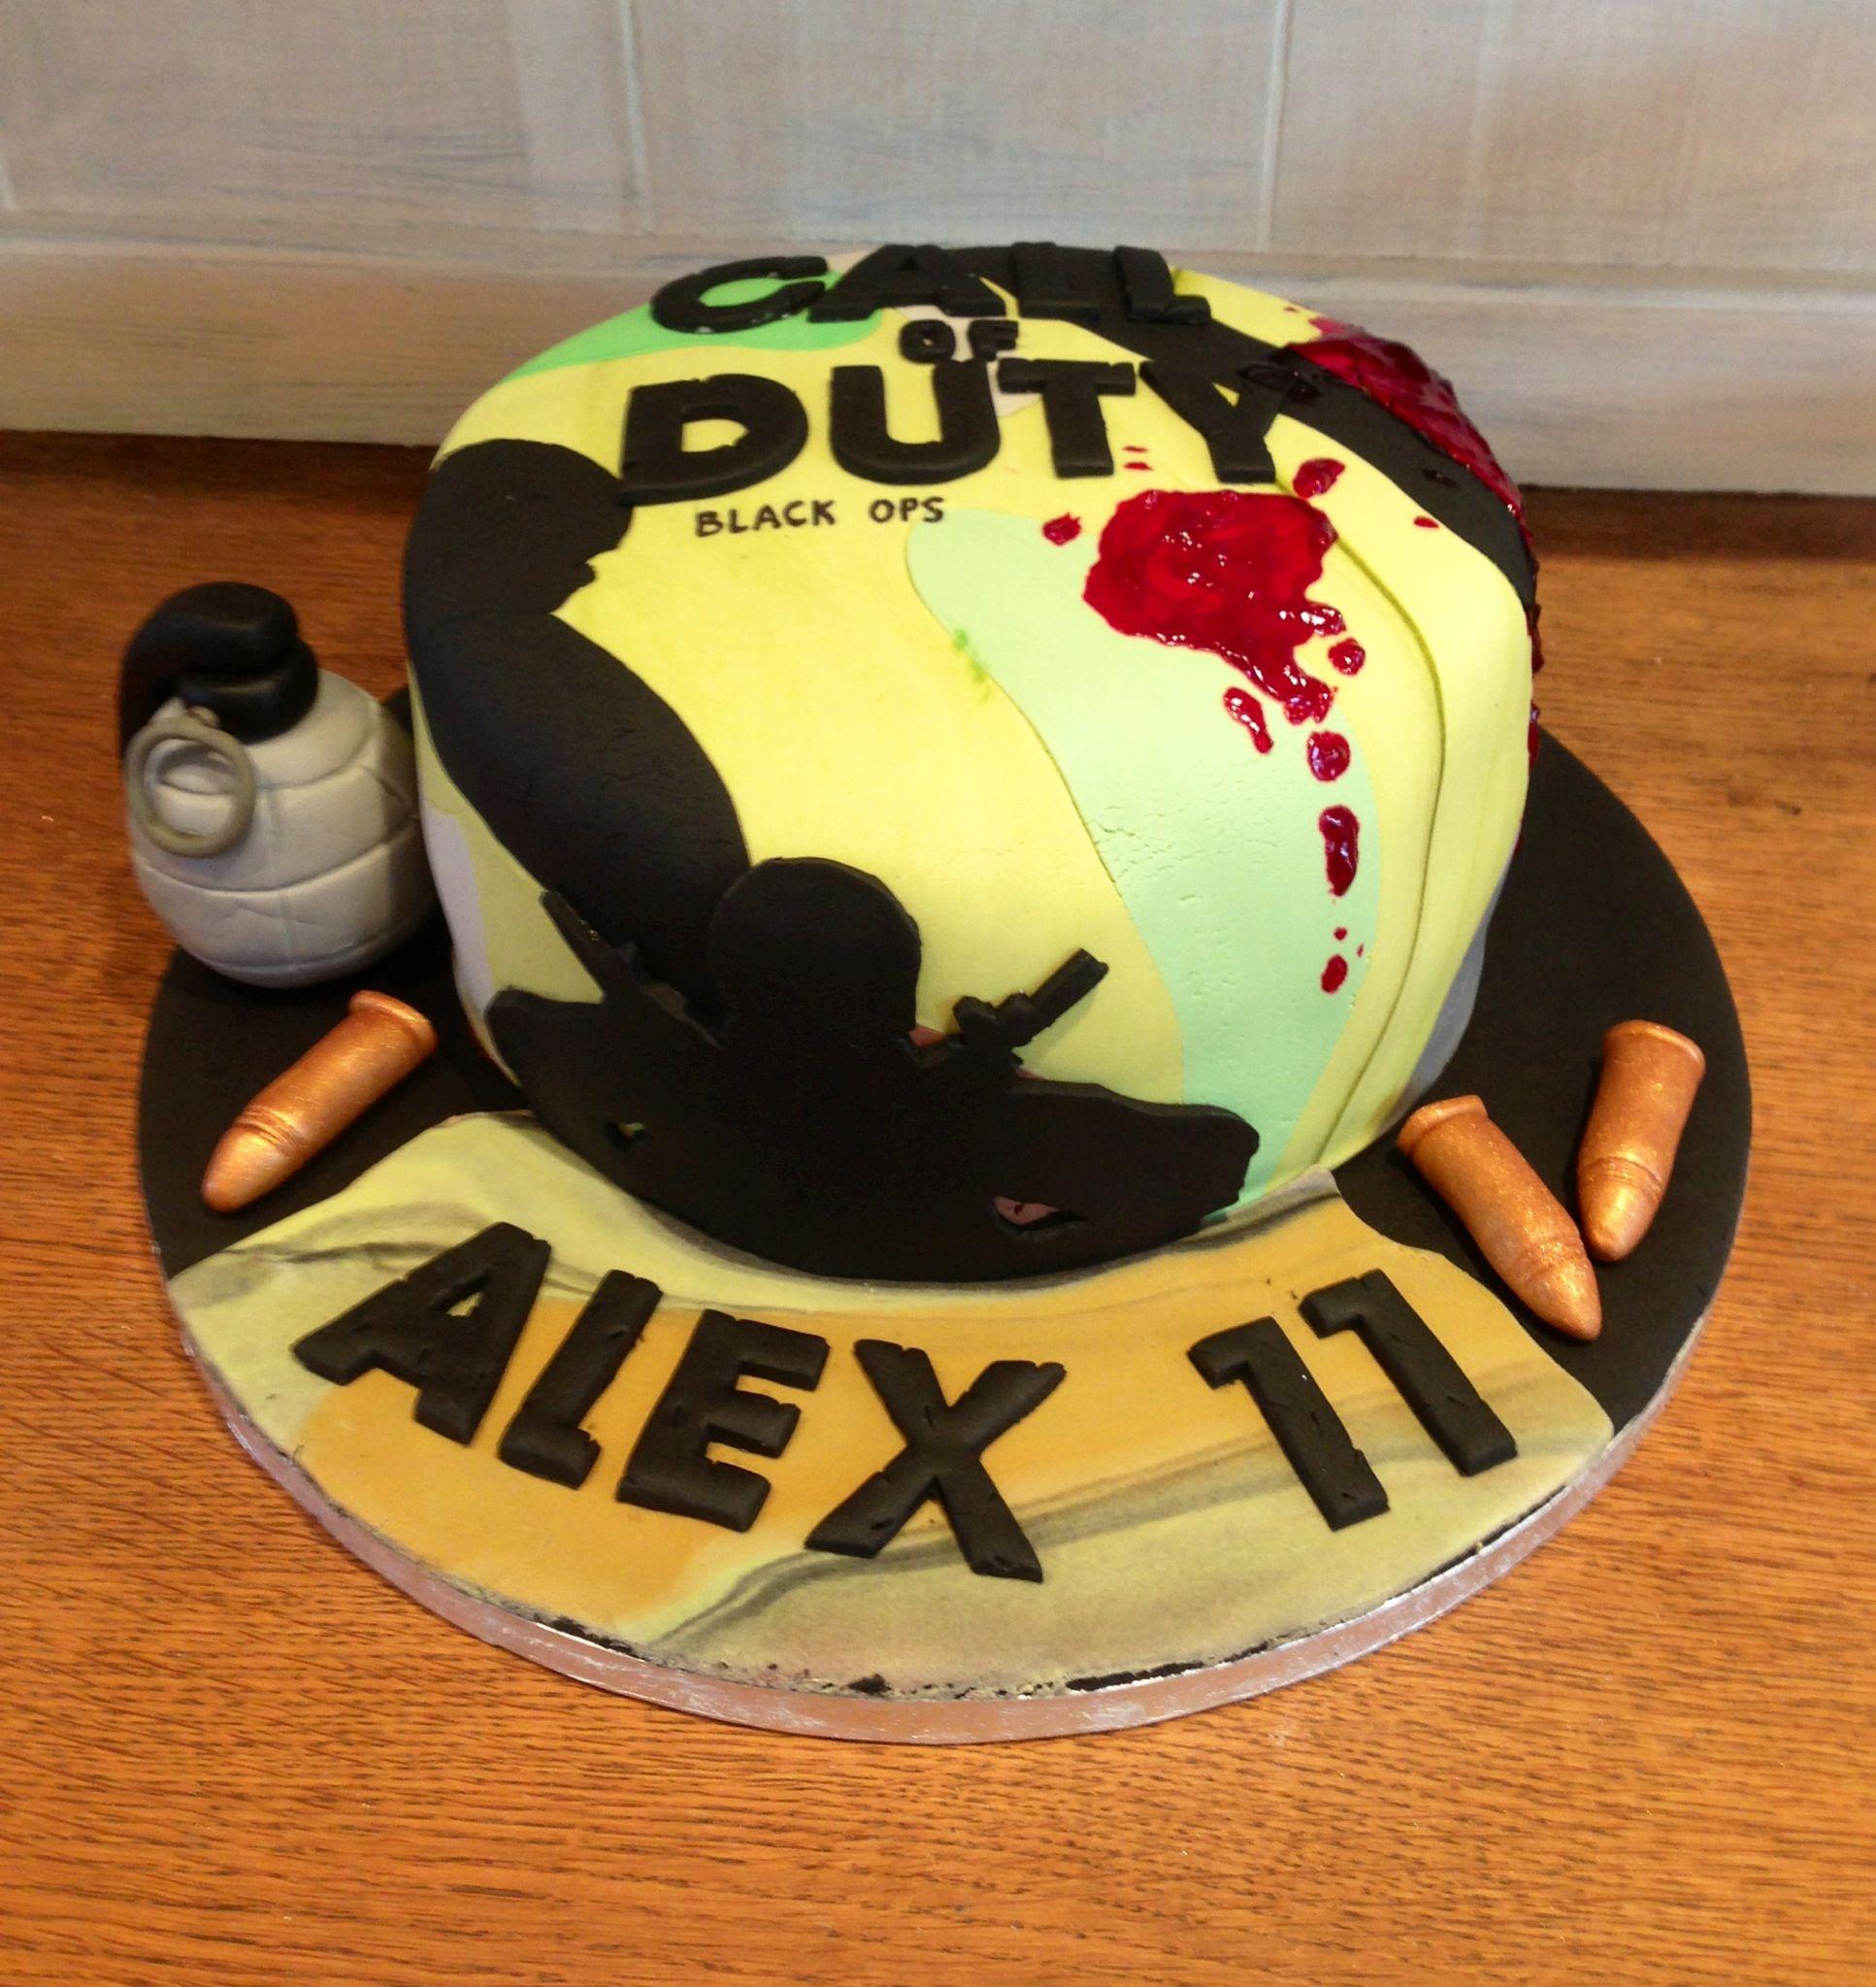 Call of duty cake call of duty cakes cake cake designs